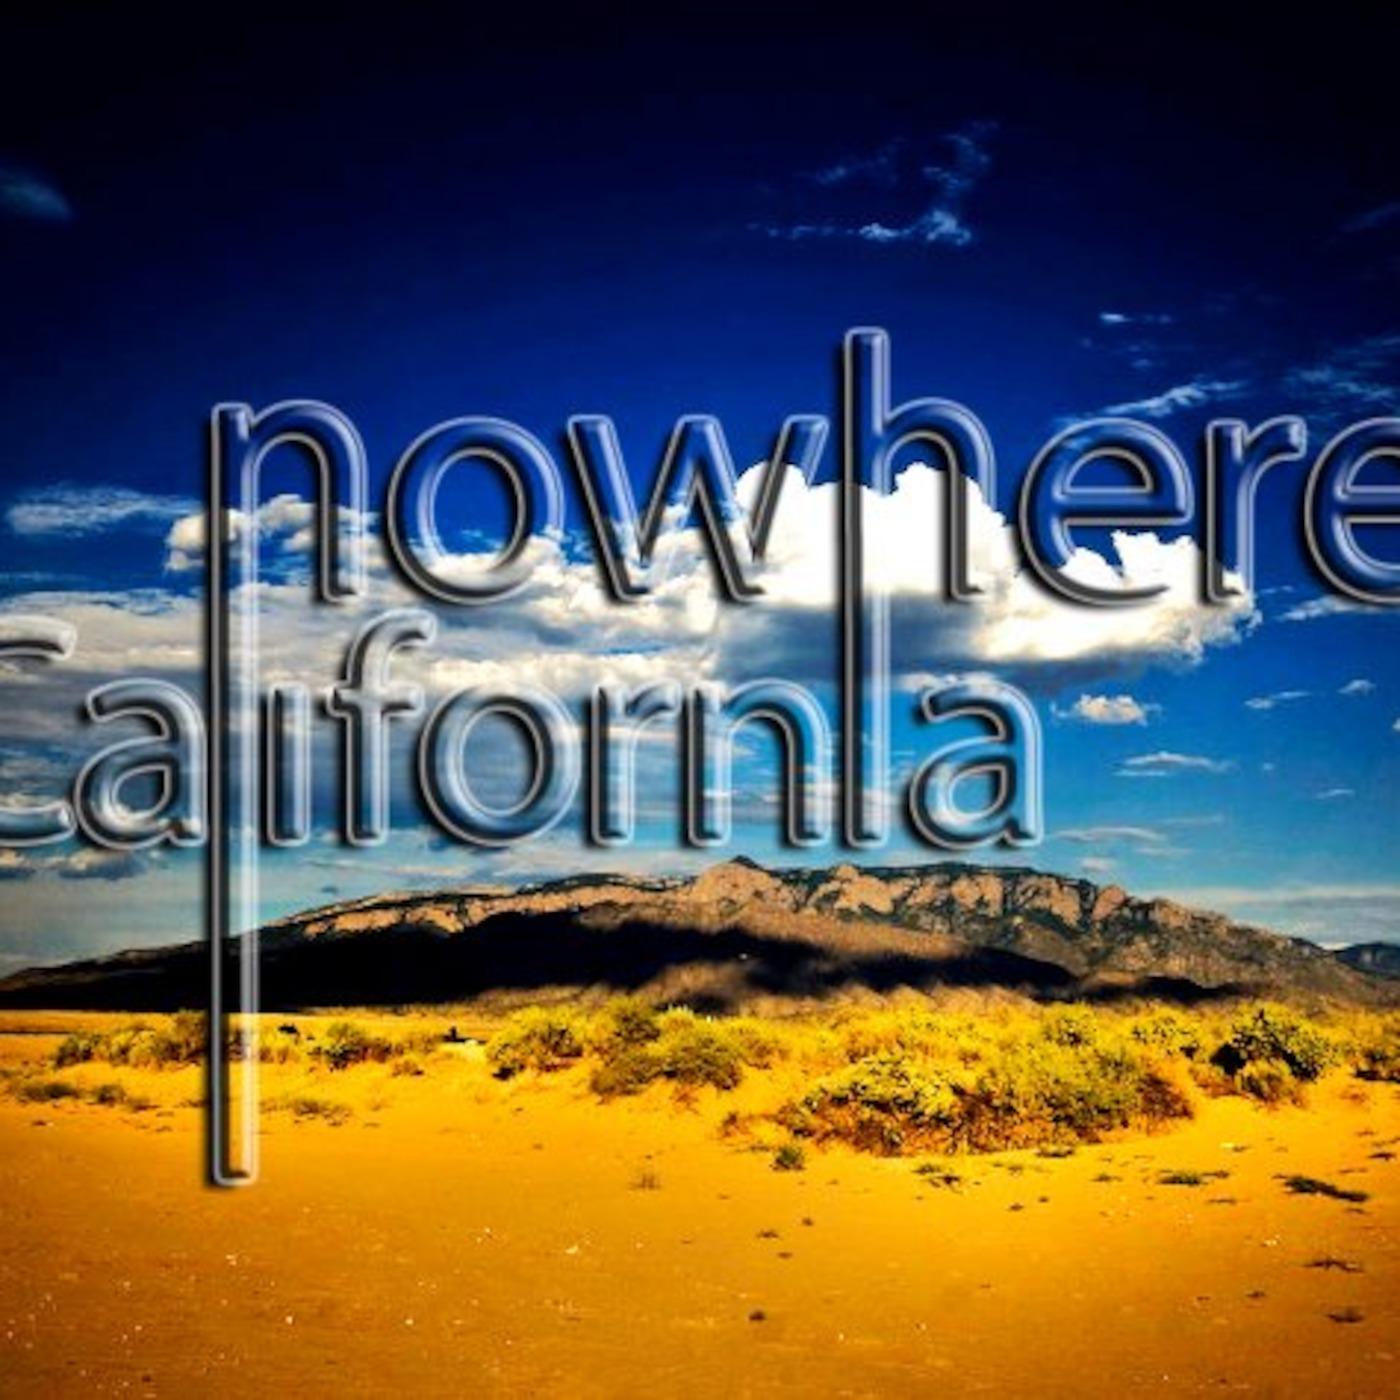 NowhereCalifornia Podcast